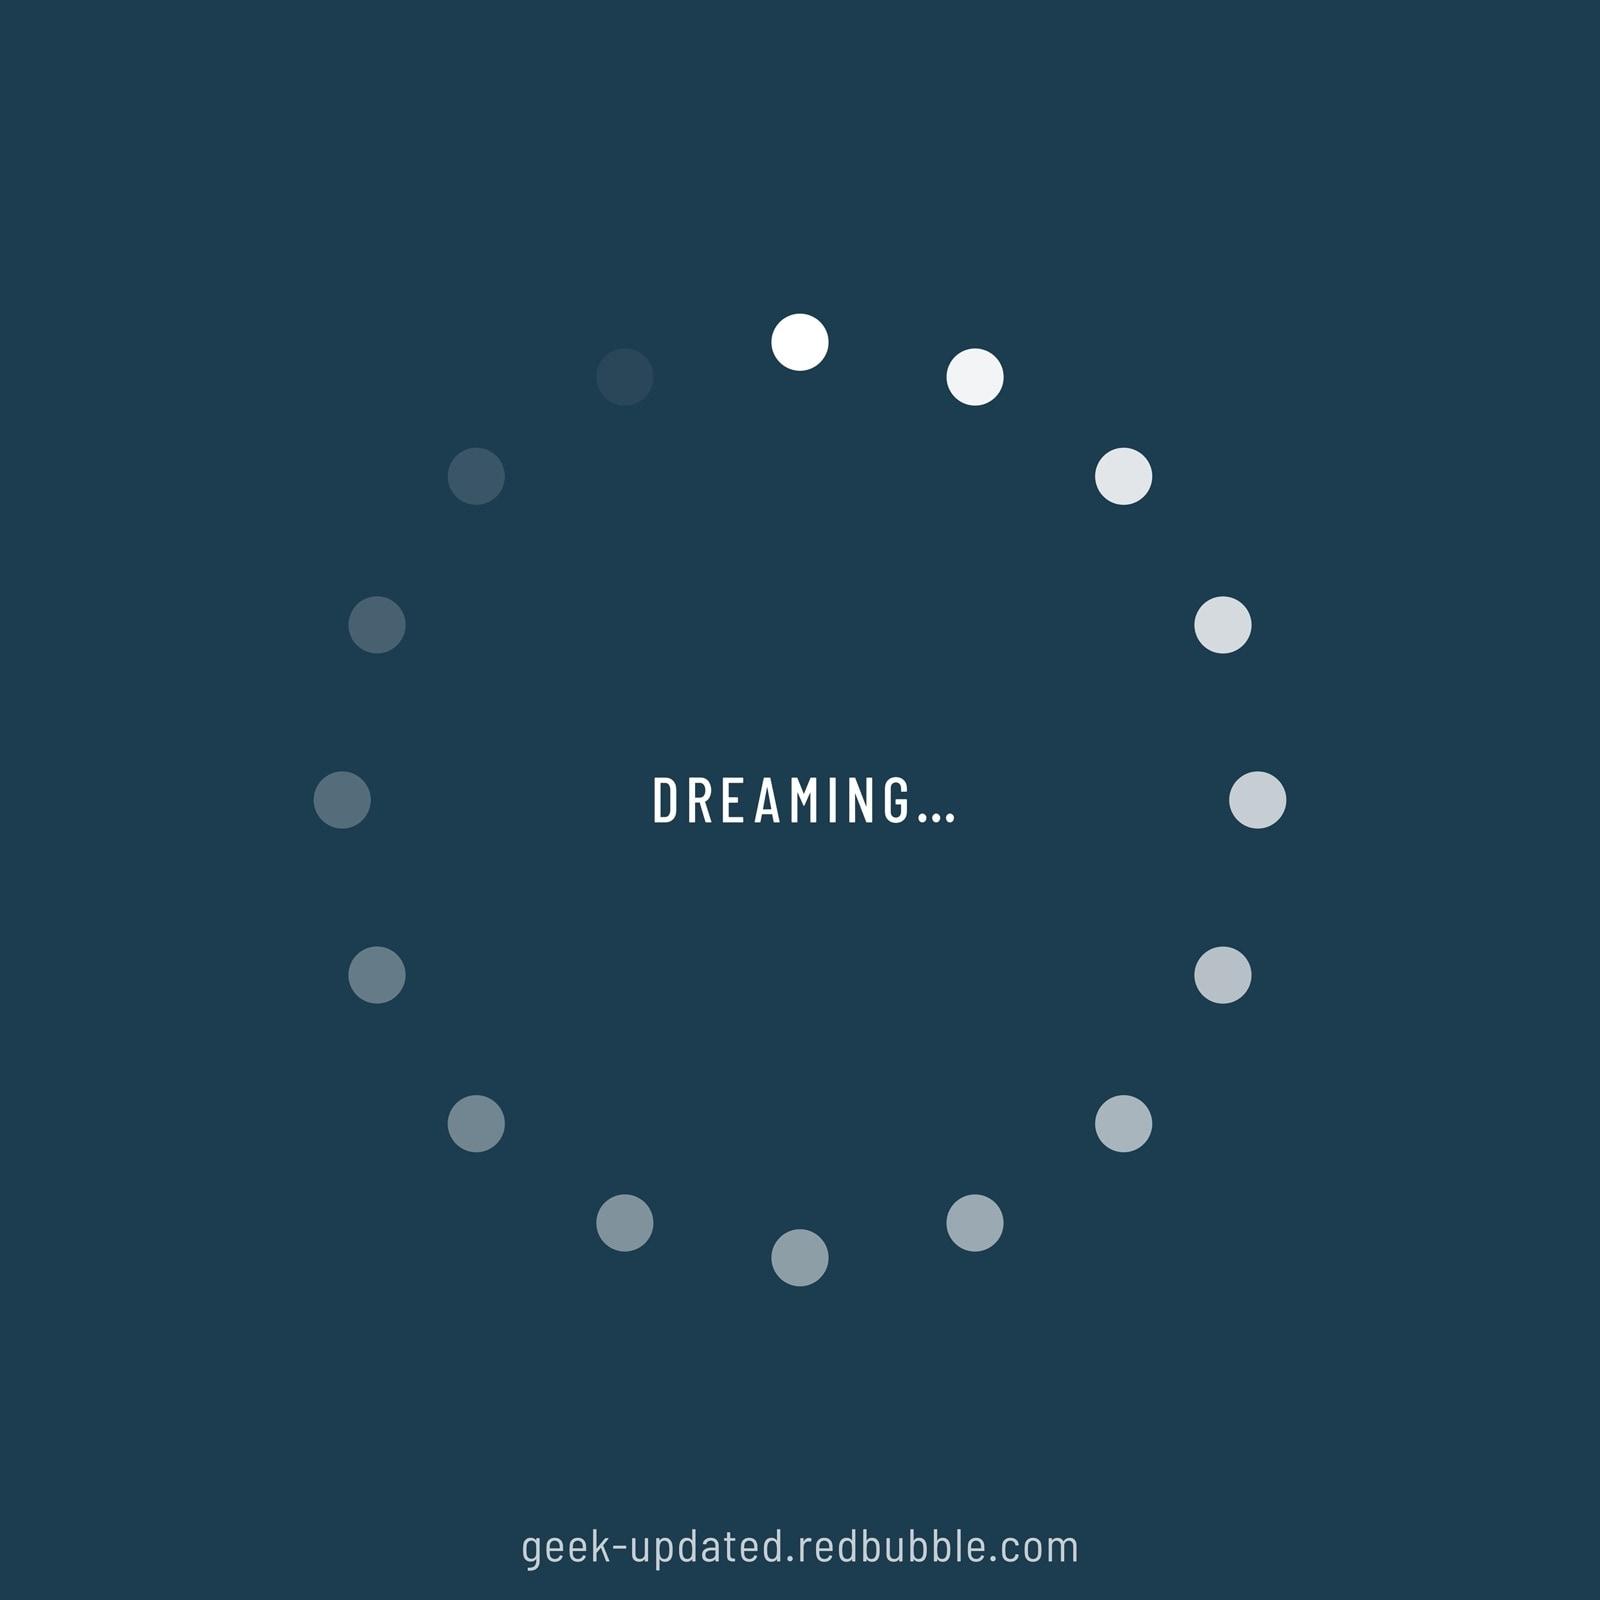 Dreaming-loading icon - design by Piotr Kowalczyk